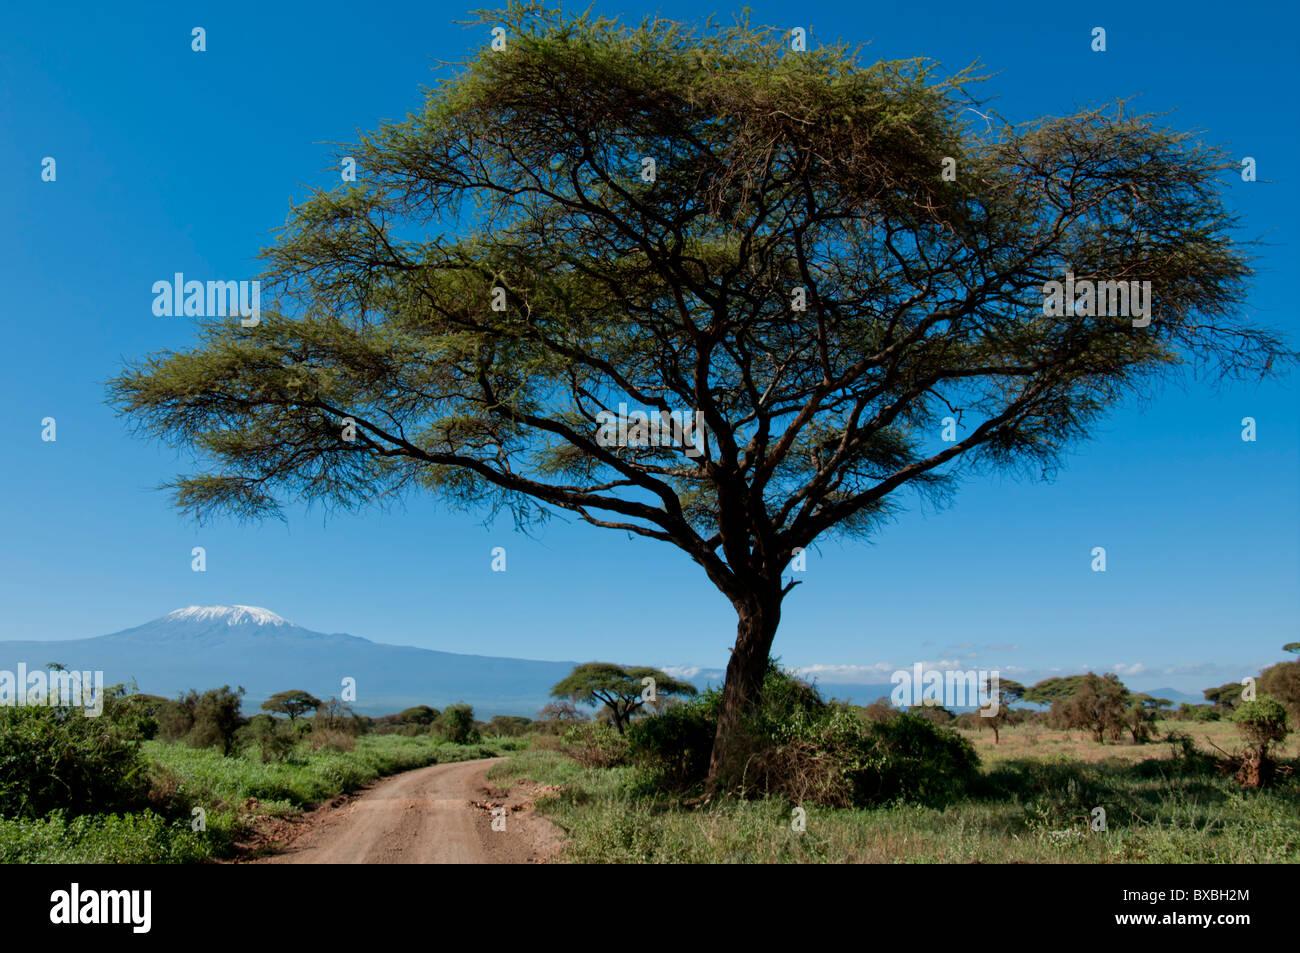 East Africa, Kenya, Amboseli, road Kilimanjaro - Stock Image